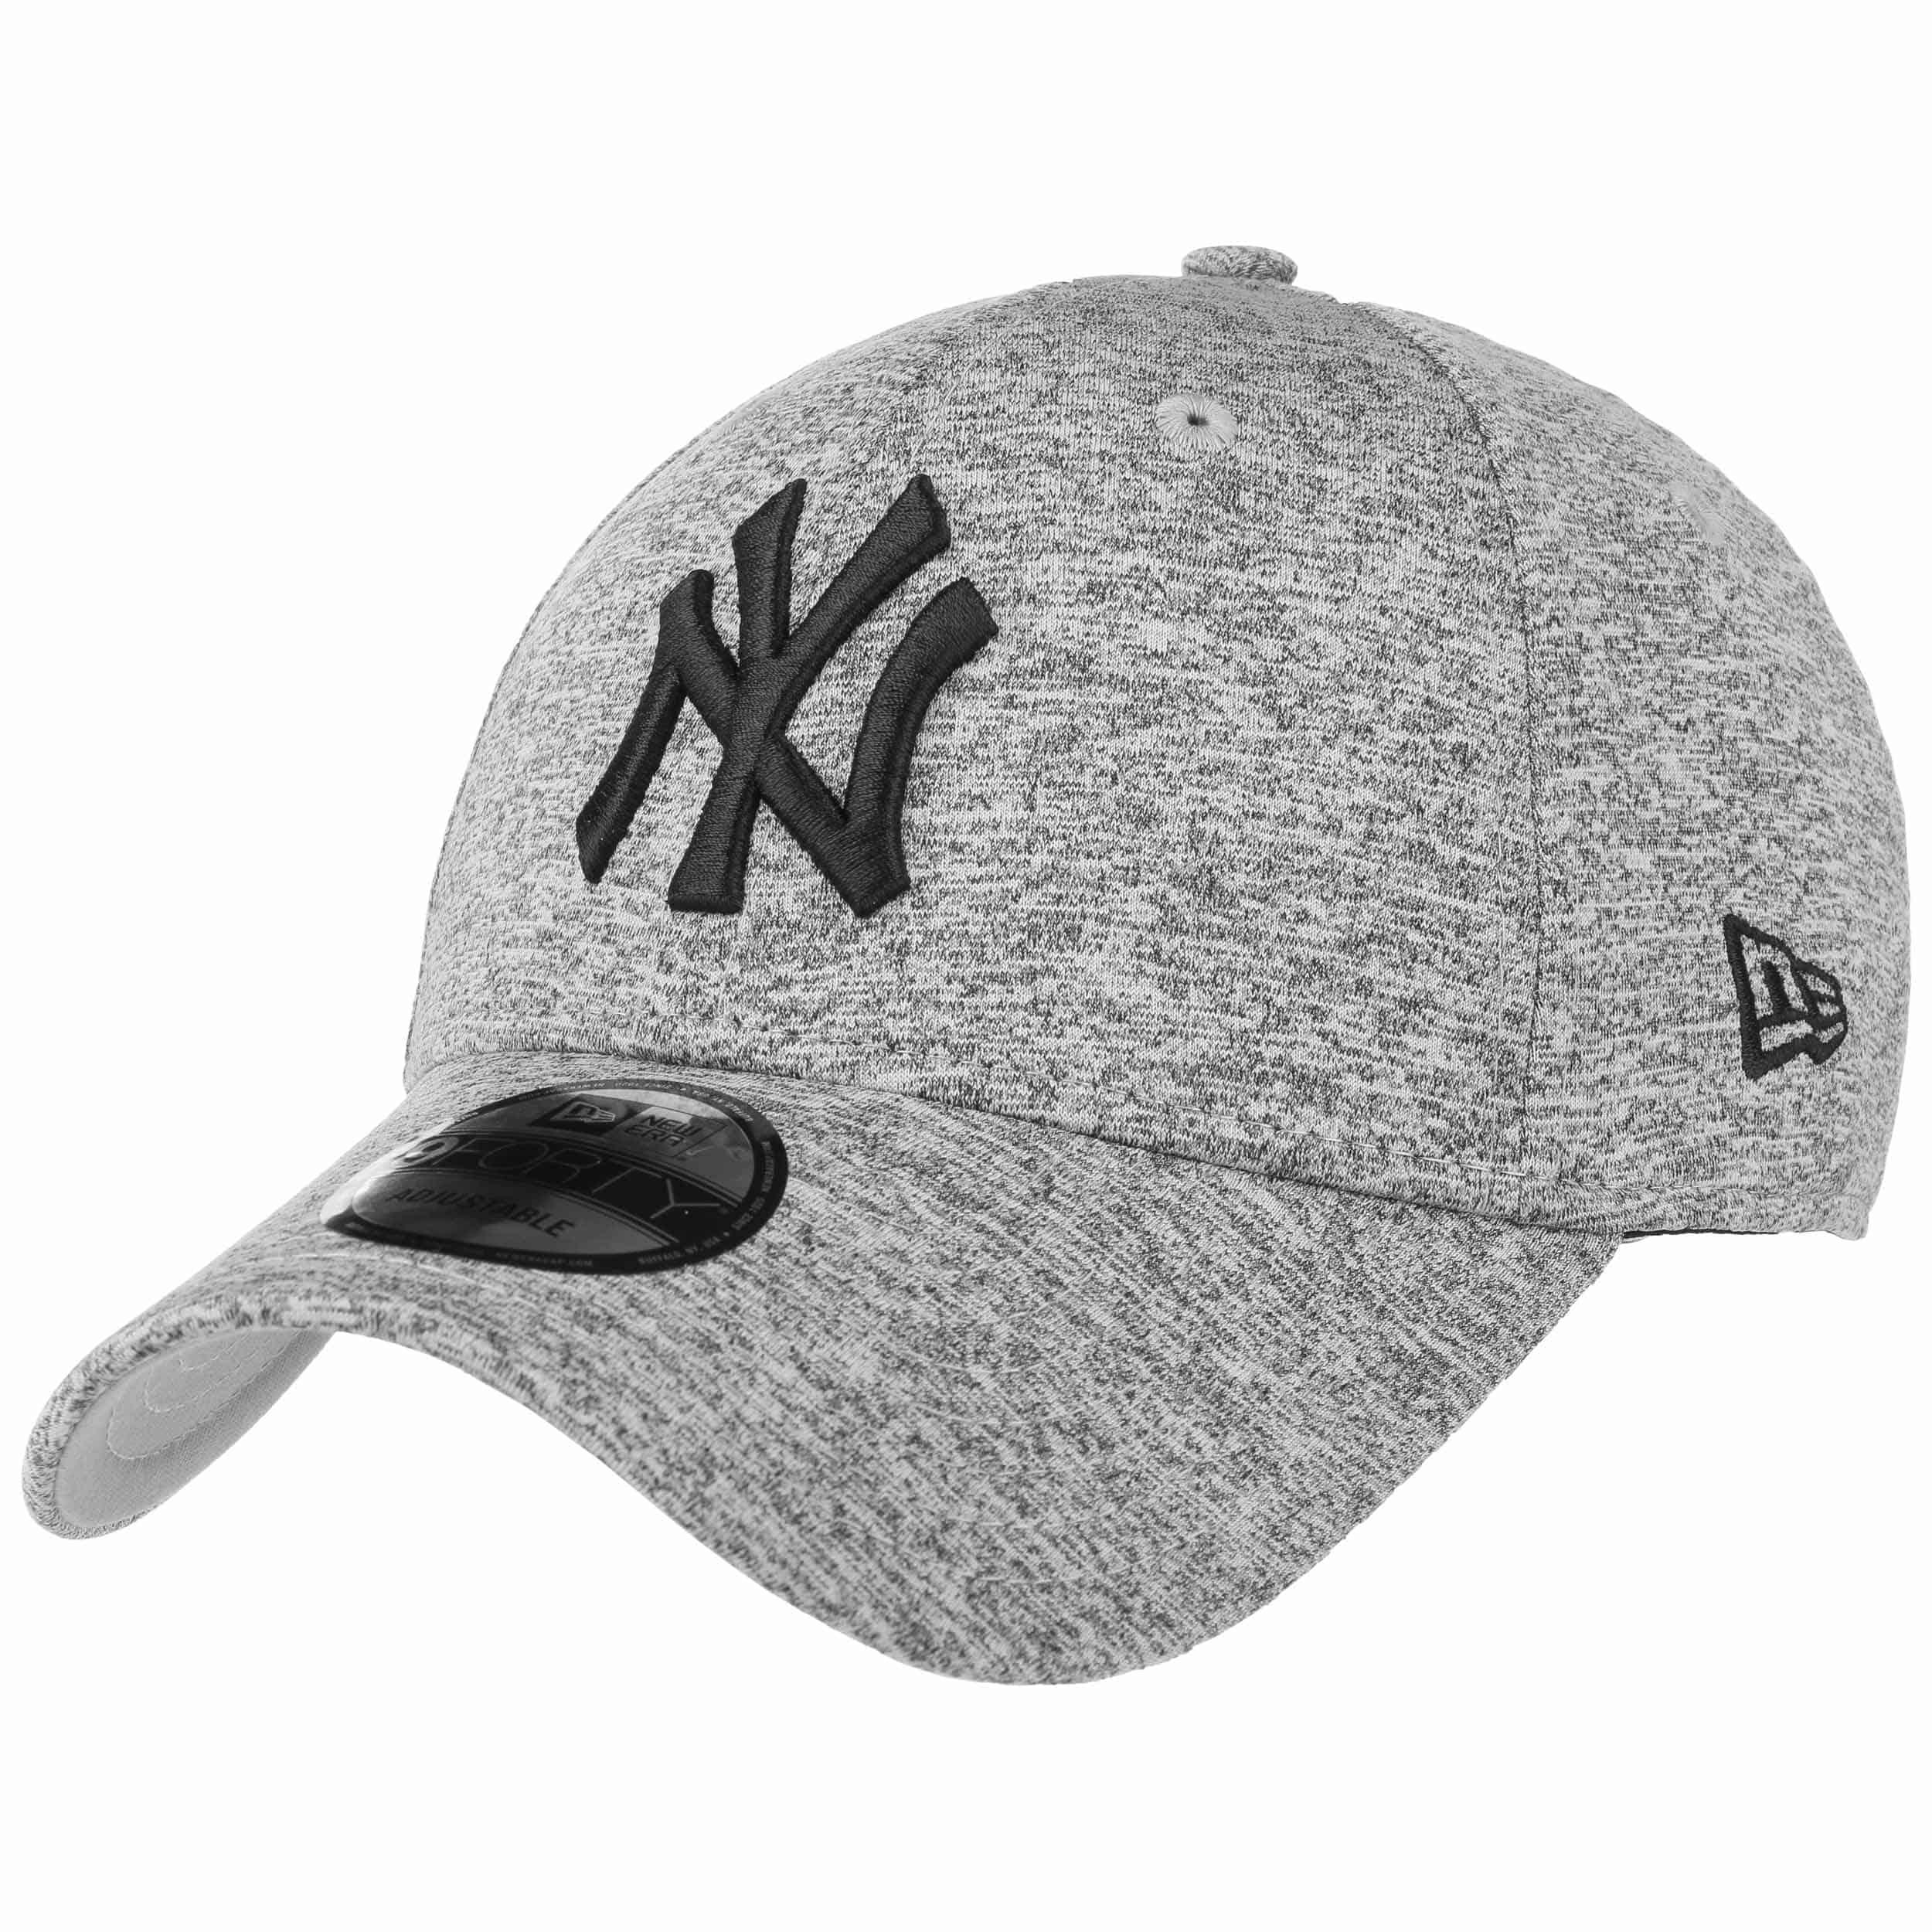 45ca23e4 9Forty Tech Jersey Yankees Cap by New Era